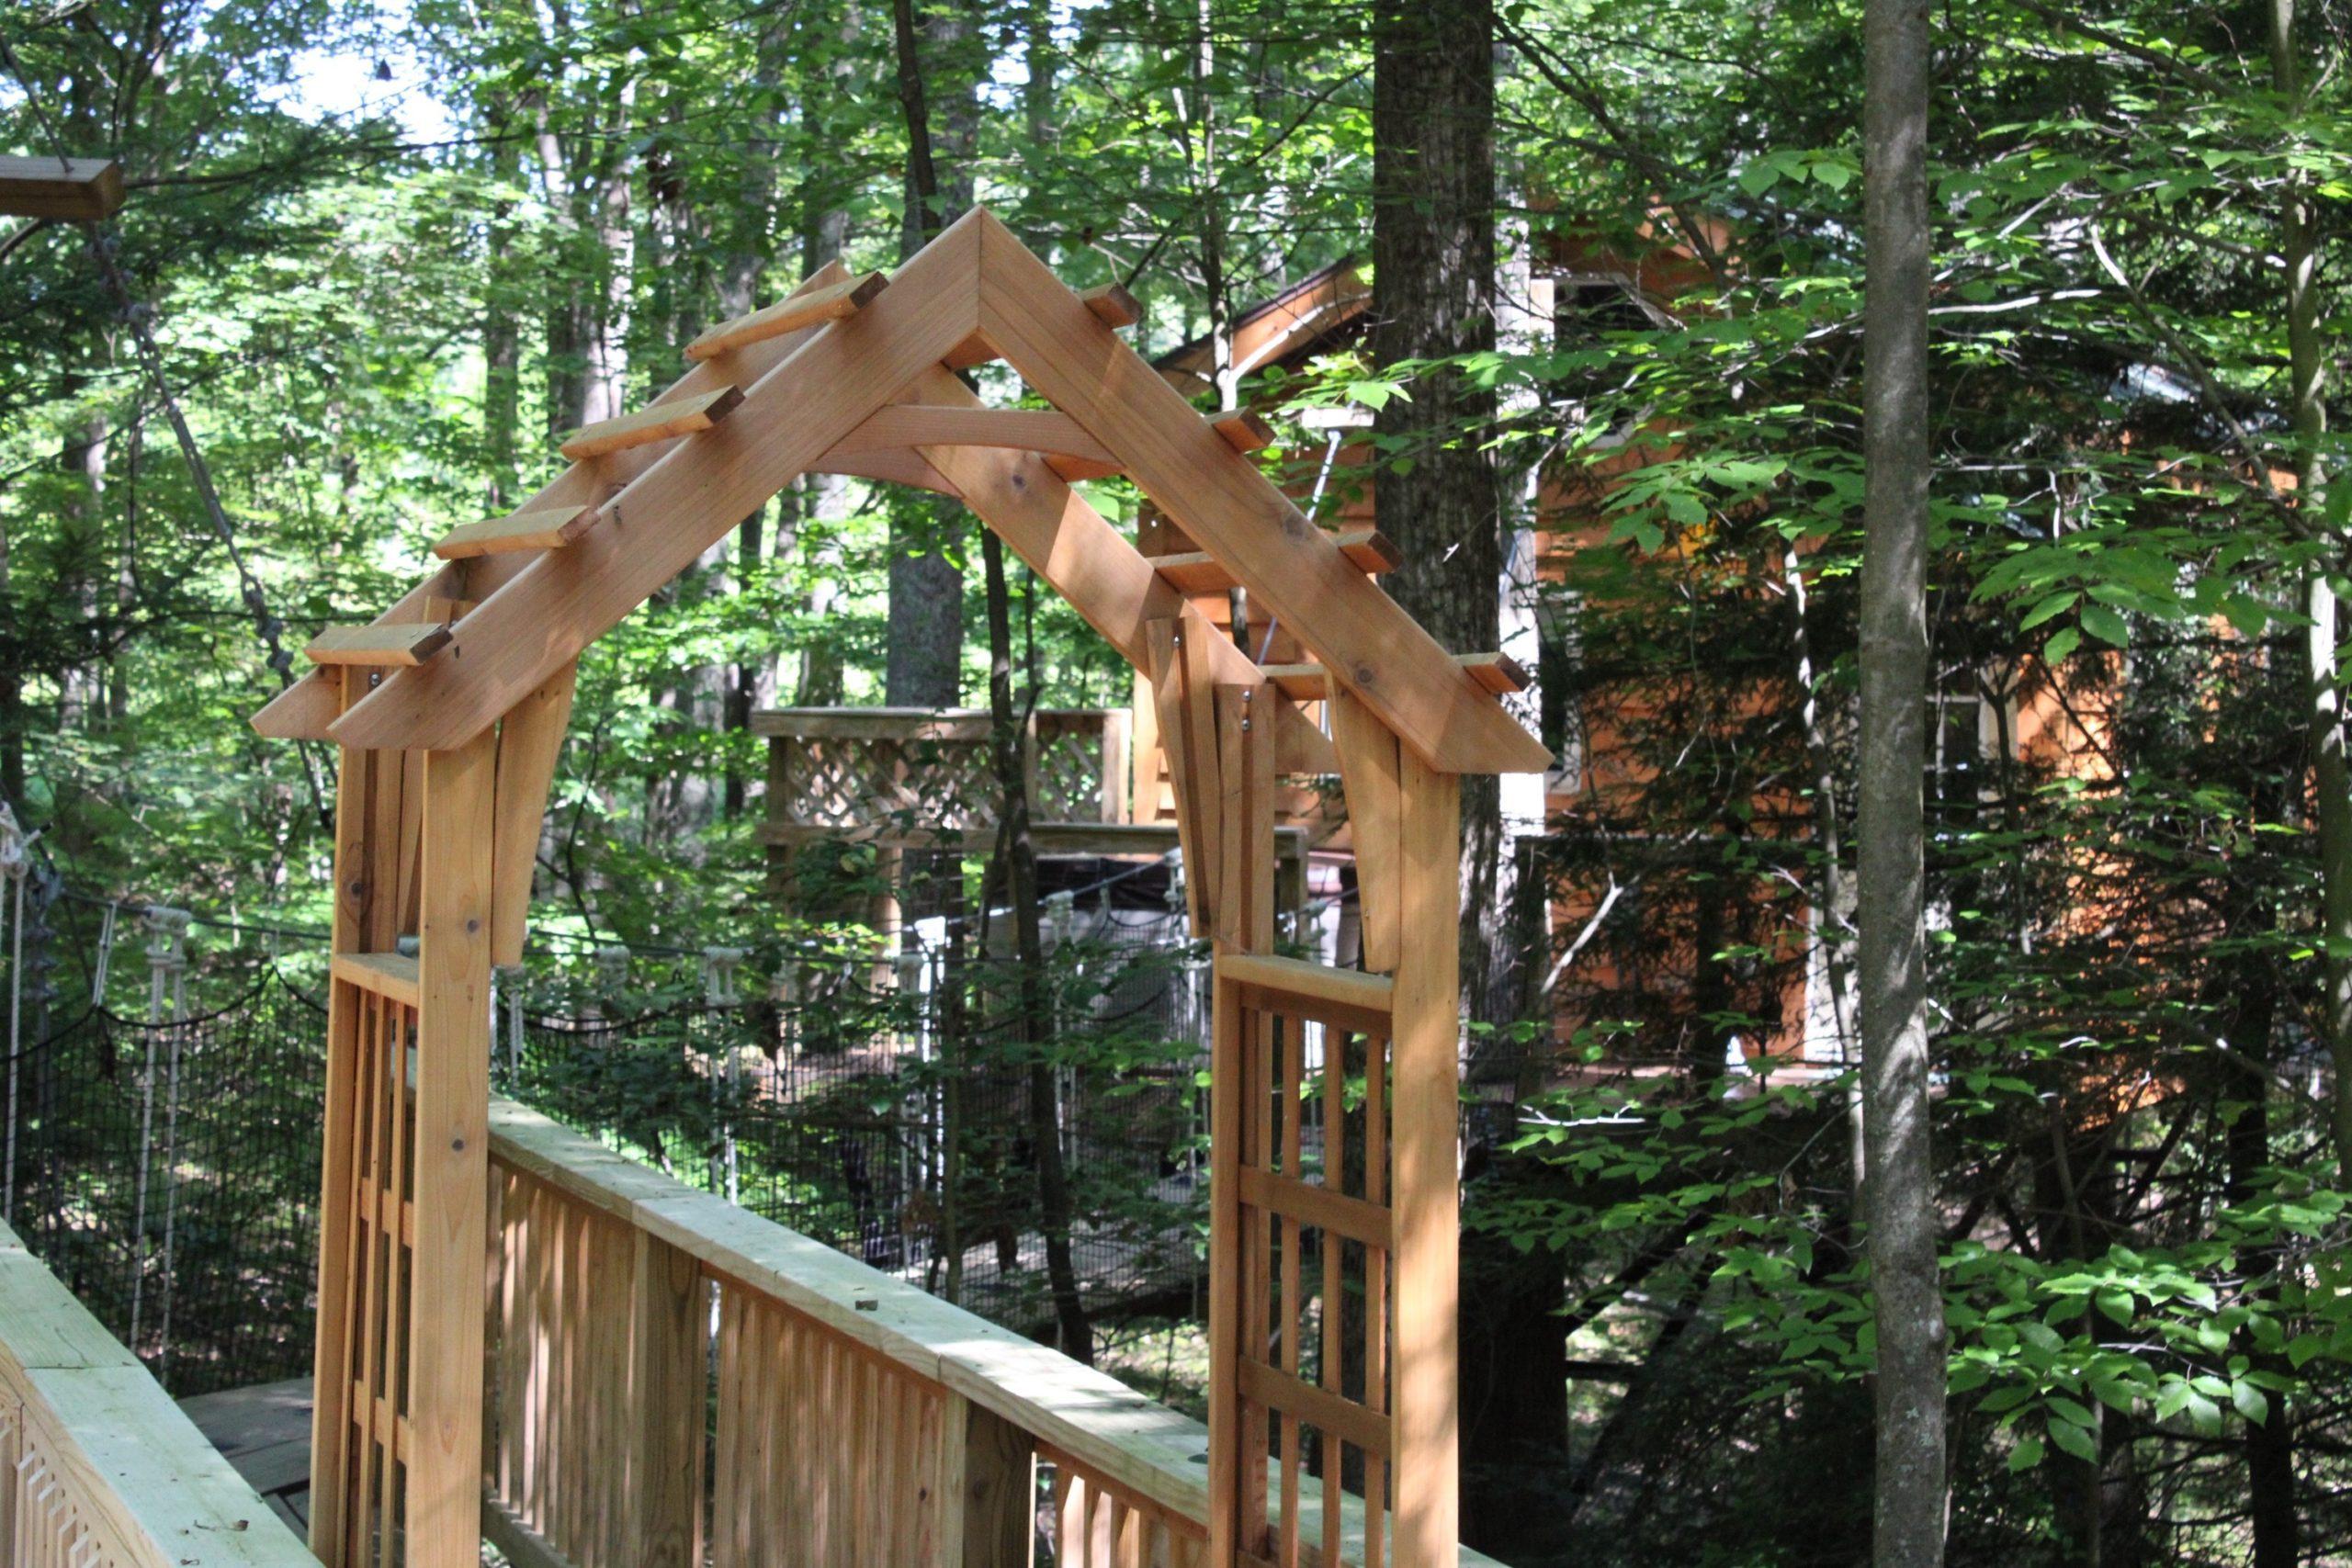 Tuscany Tree House Cabin Arch